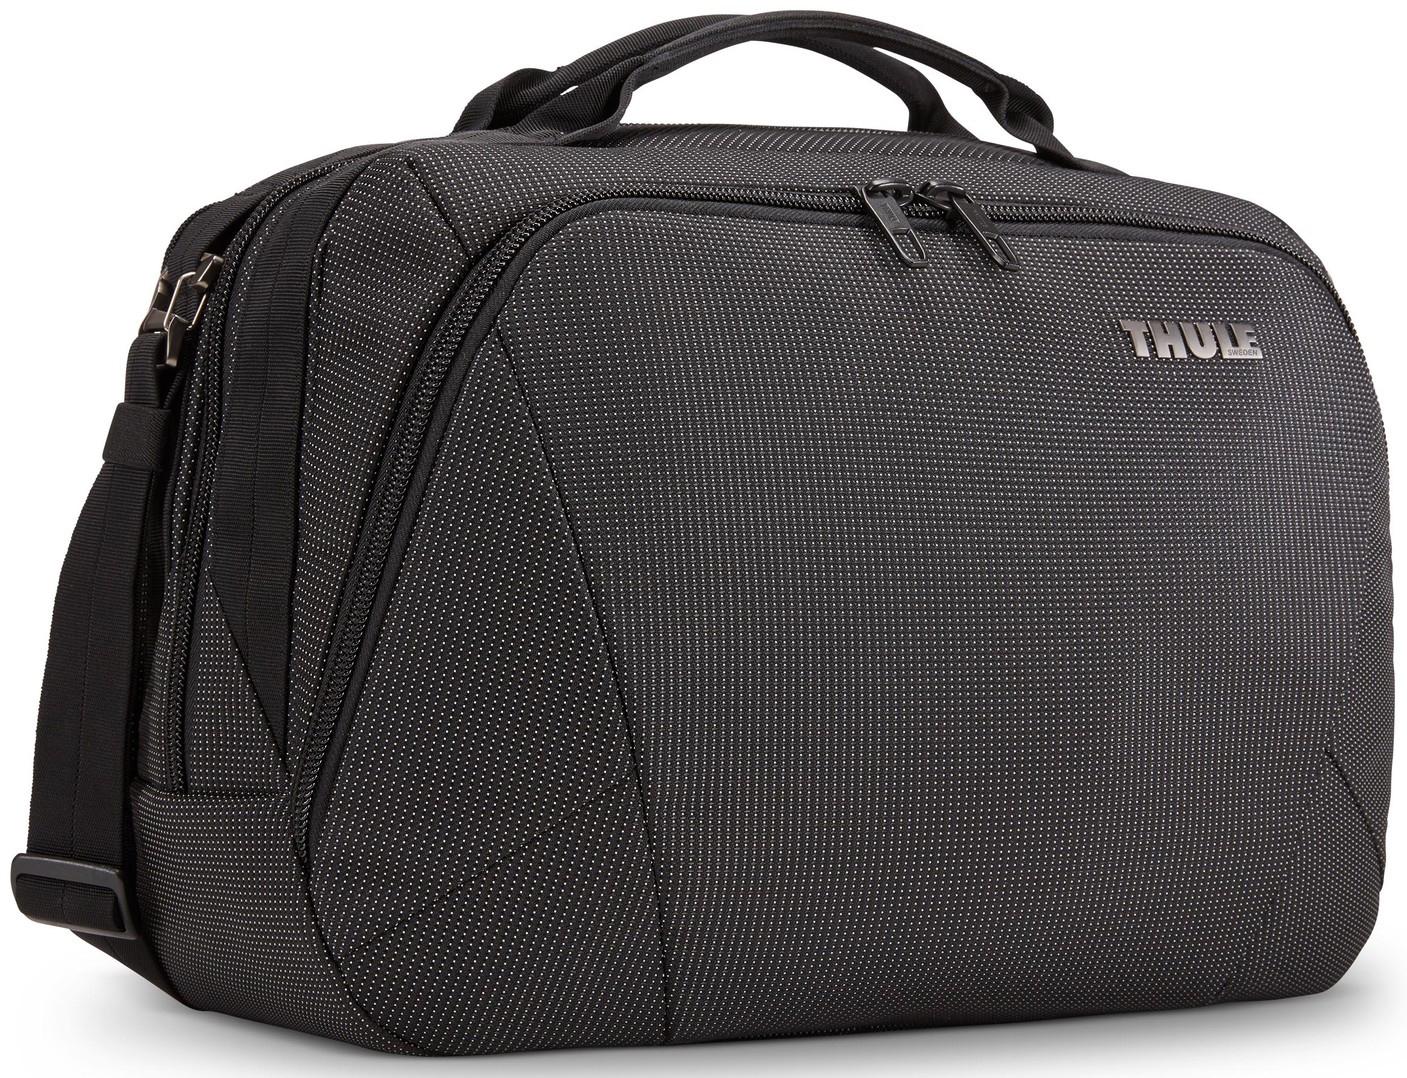 Новинки Городская сумка через плечо Thule Crossover 2 Boarding Bag 3204056.jpg